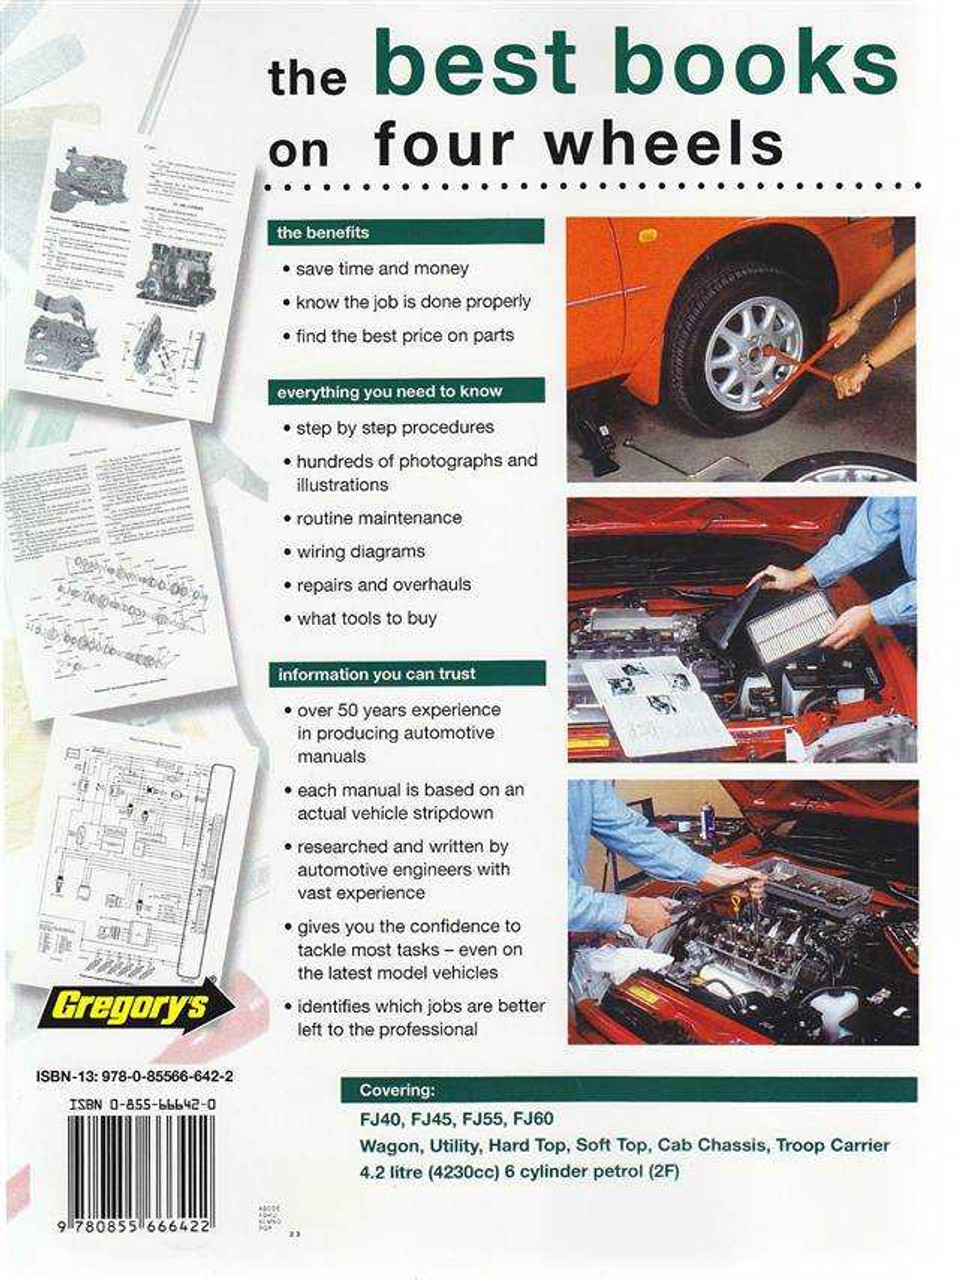 Toyota Land Cruiser FJ Series 1975 - 1984 Workshop Manual